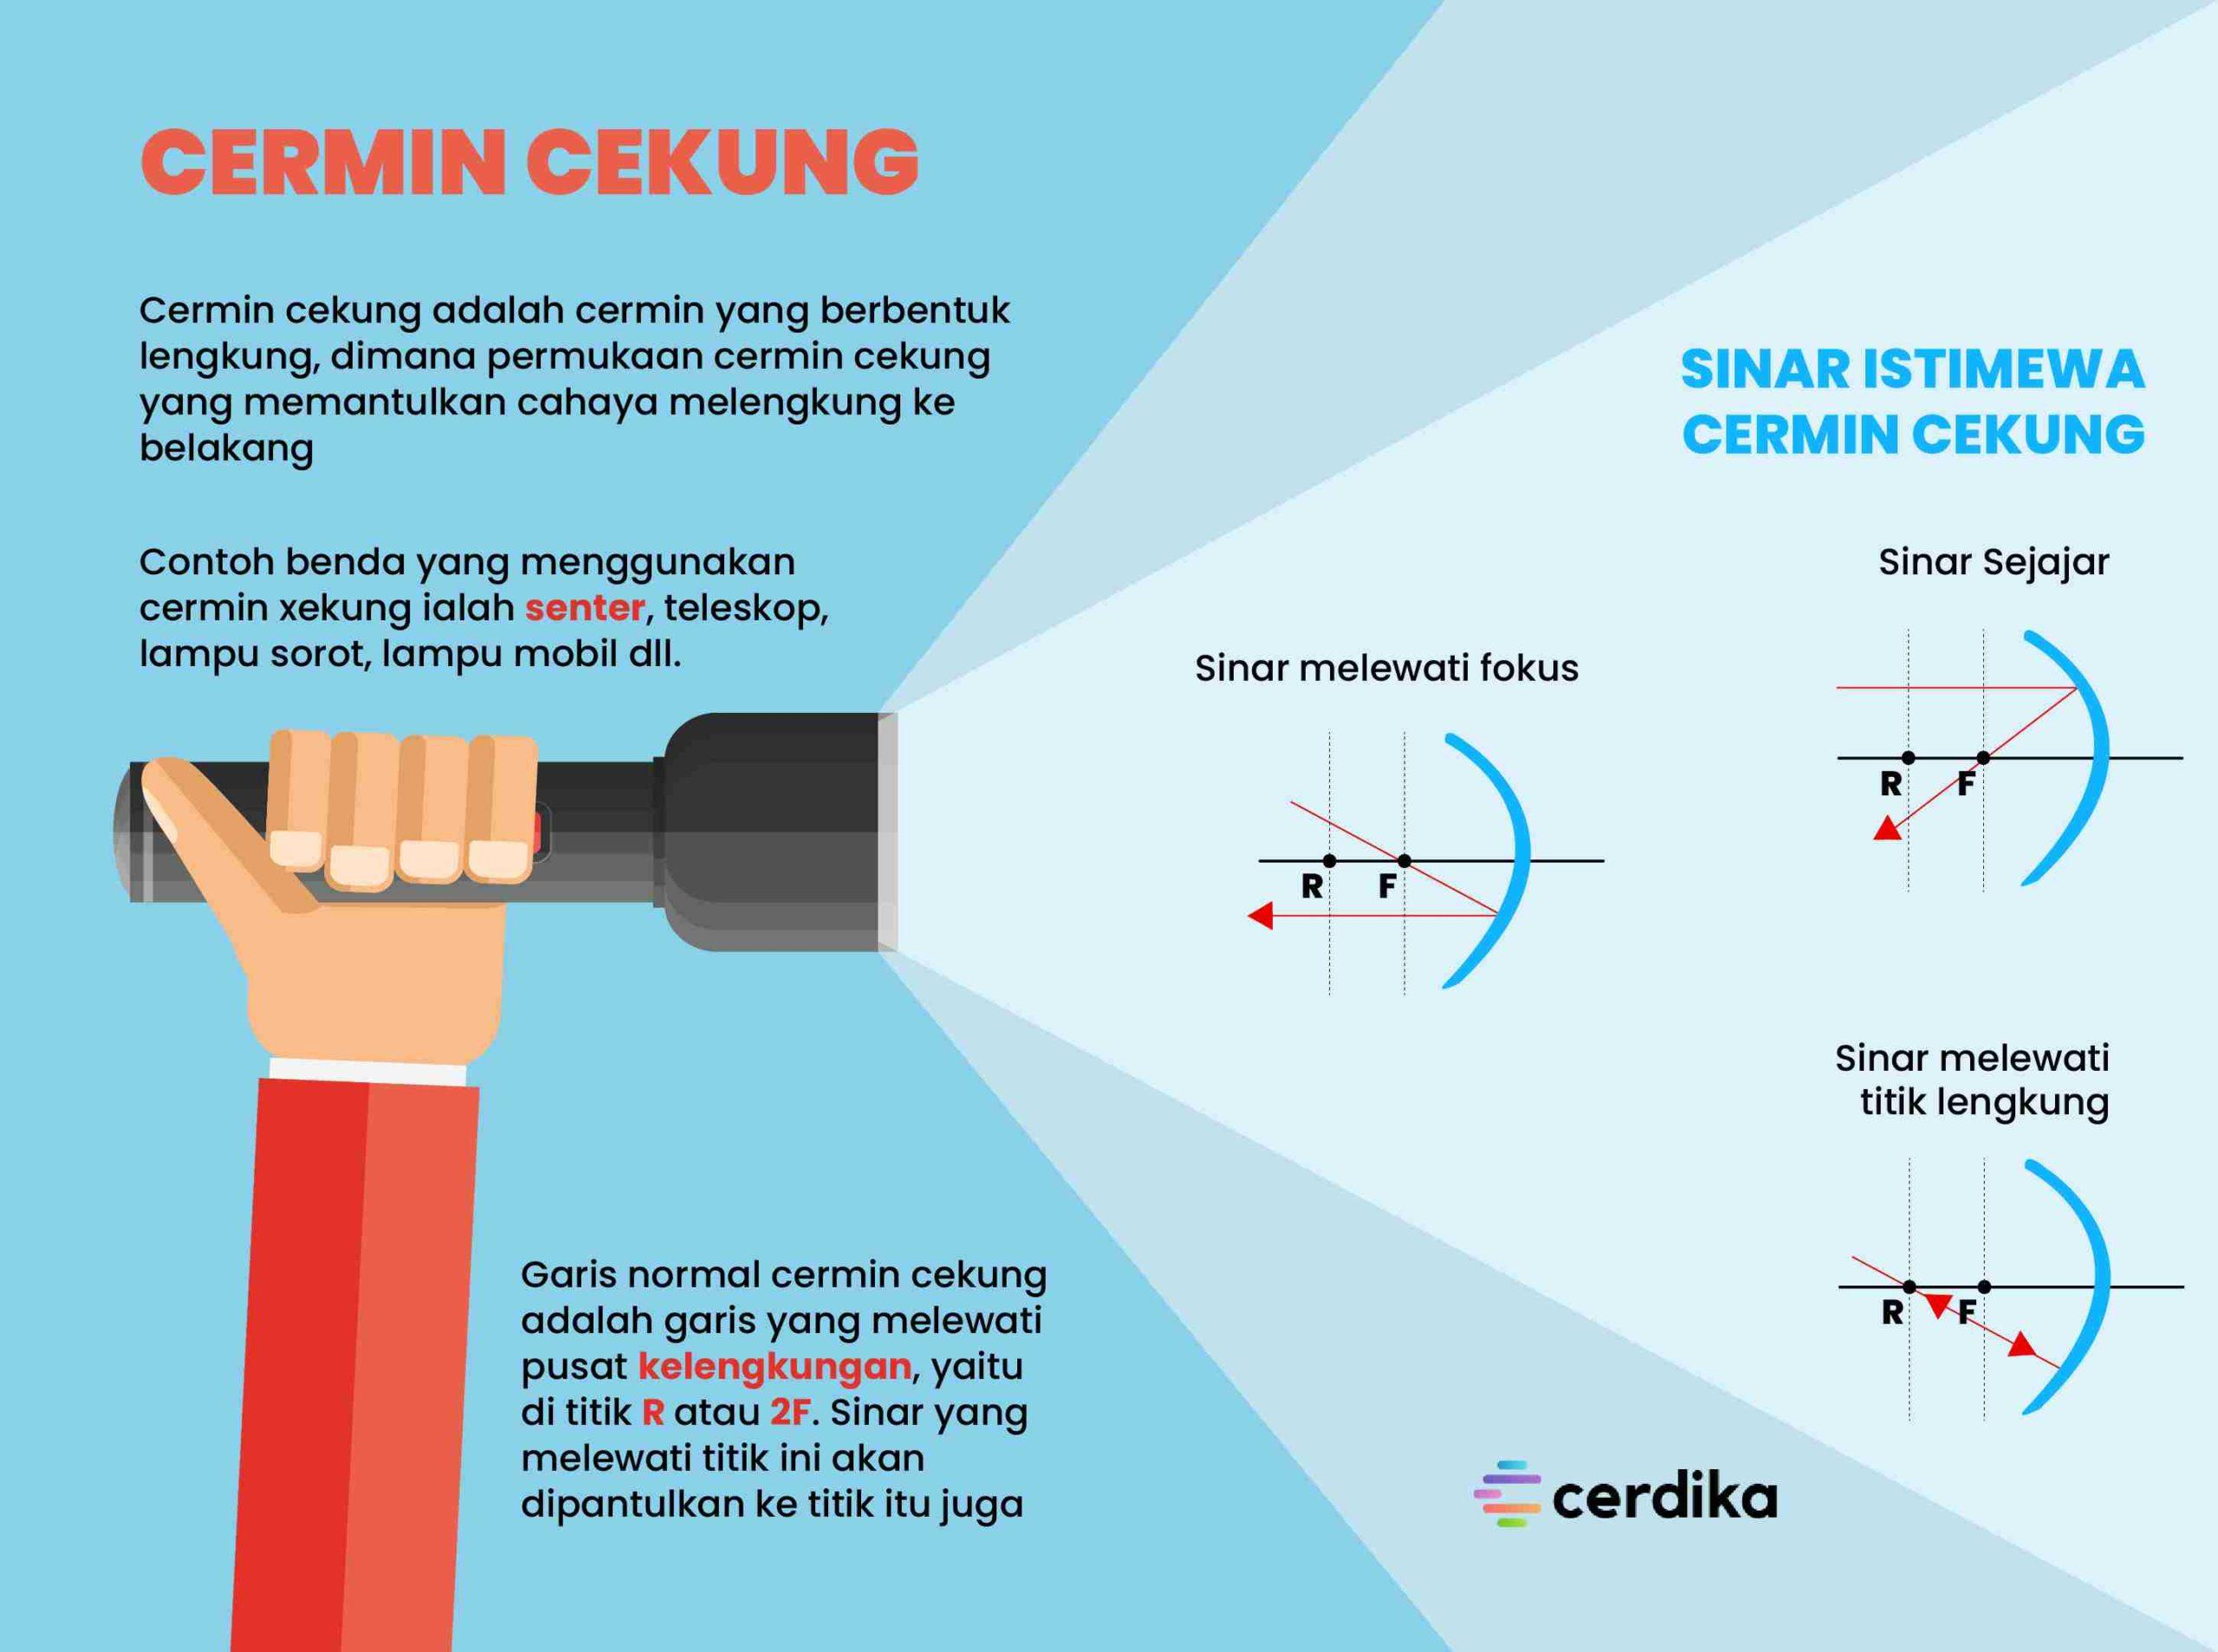 infografis cermin cekung